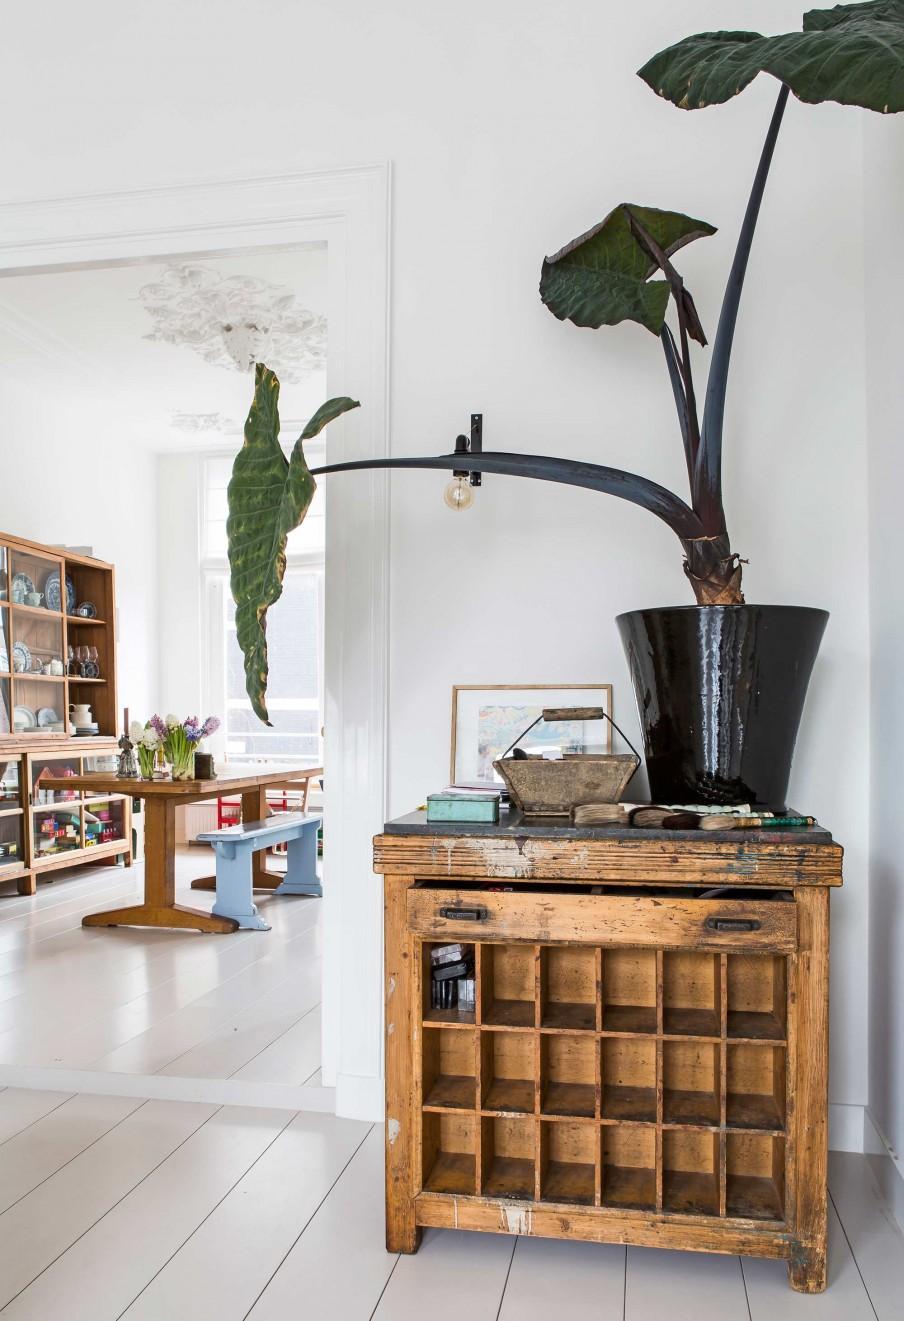 meuble-vintage-entree-maison-deco-amsterdam-lili-in-wonderland